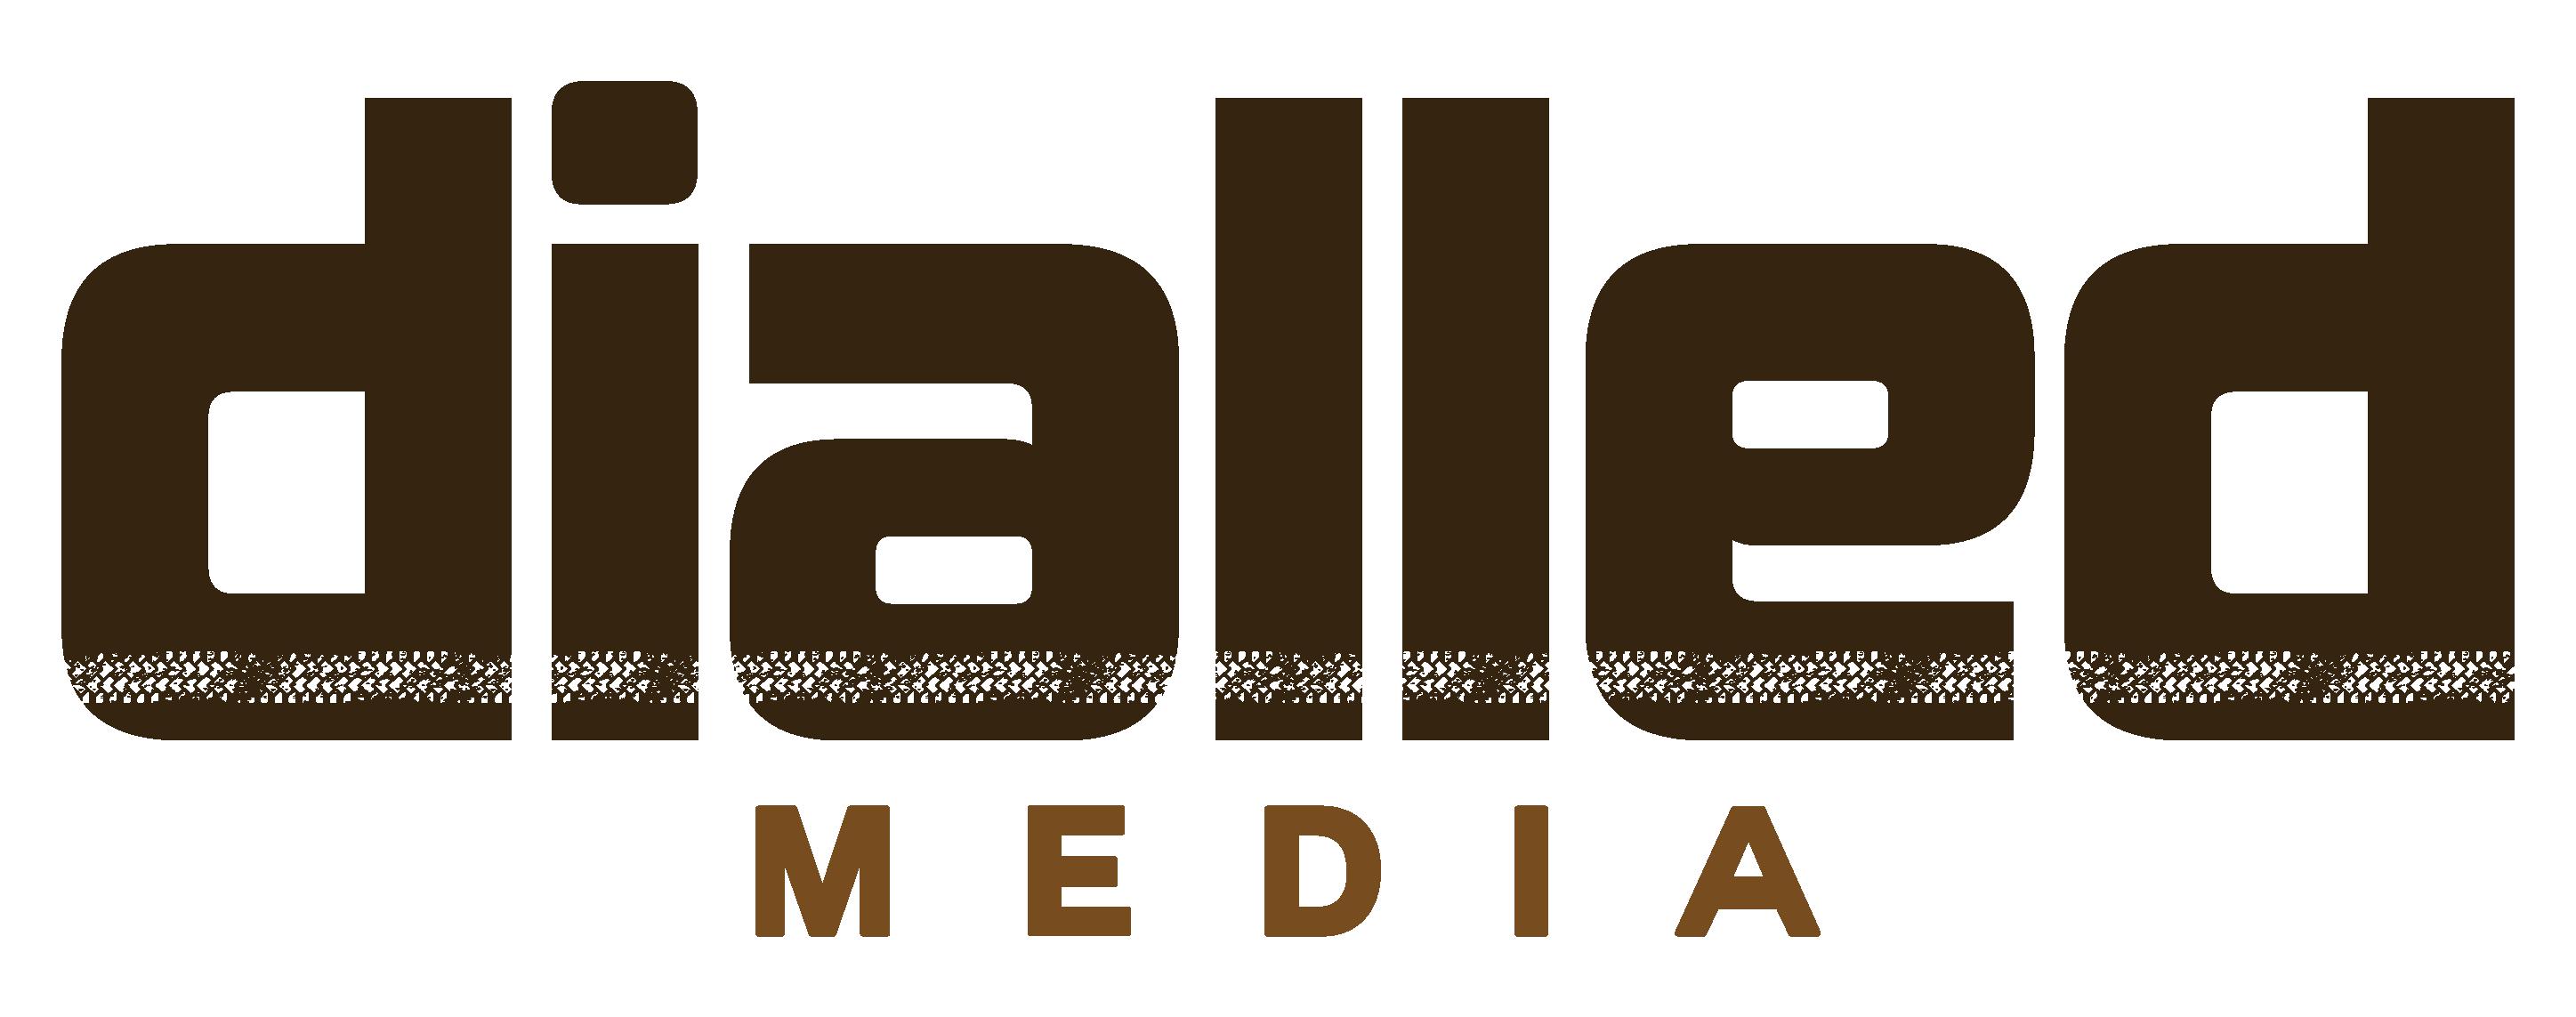 Dialled Media